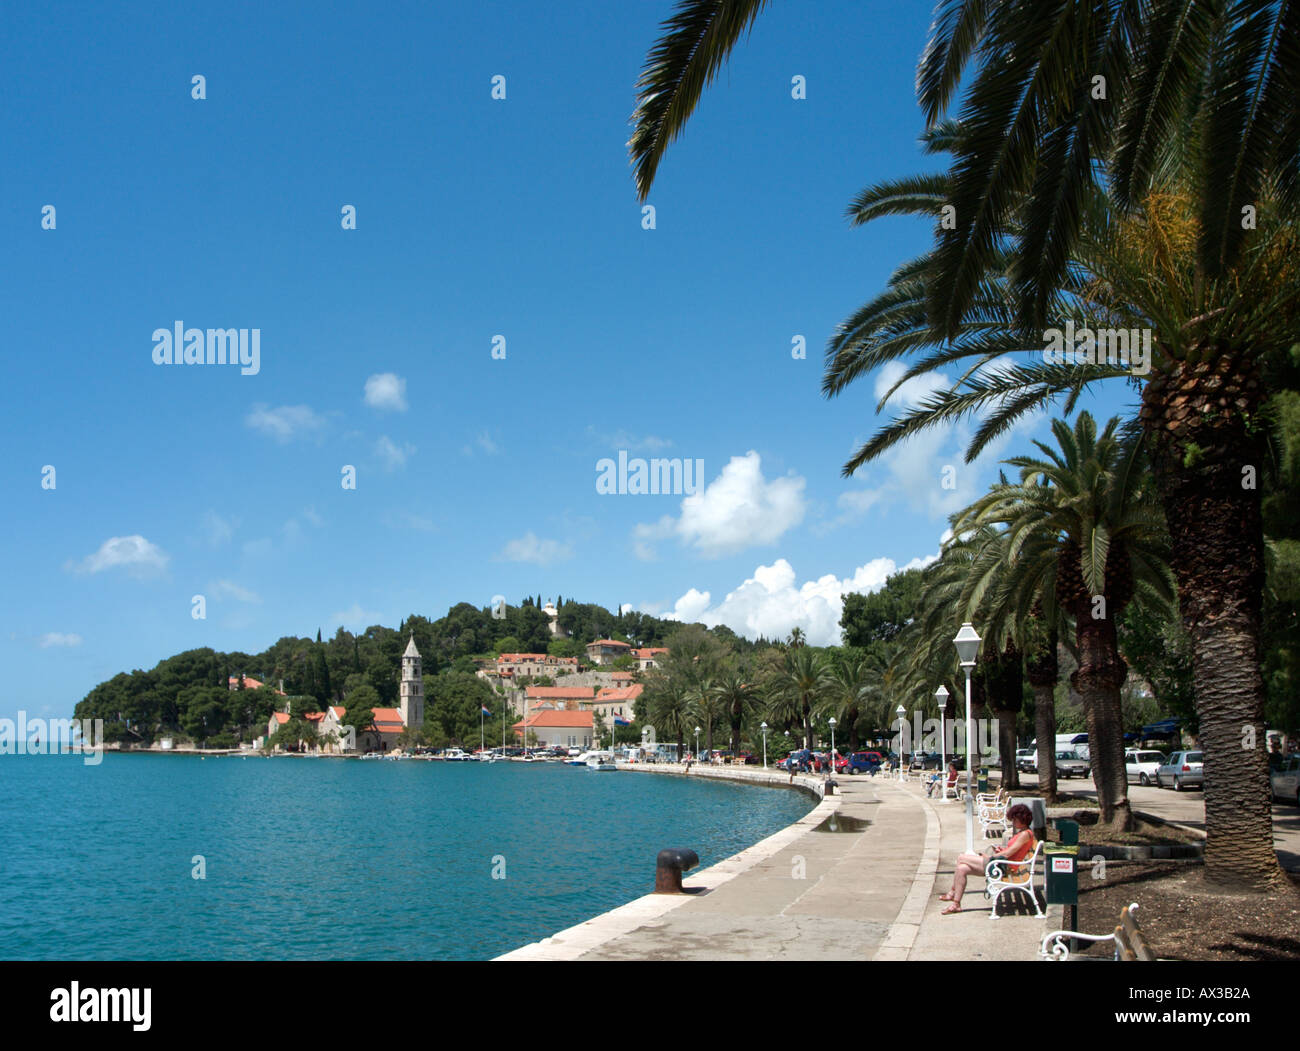 Seafront in Cavtat, Dubrovnik Riviera, Dalmatian Coast, Croatia - Stock Image